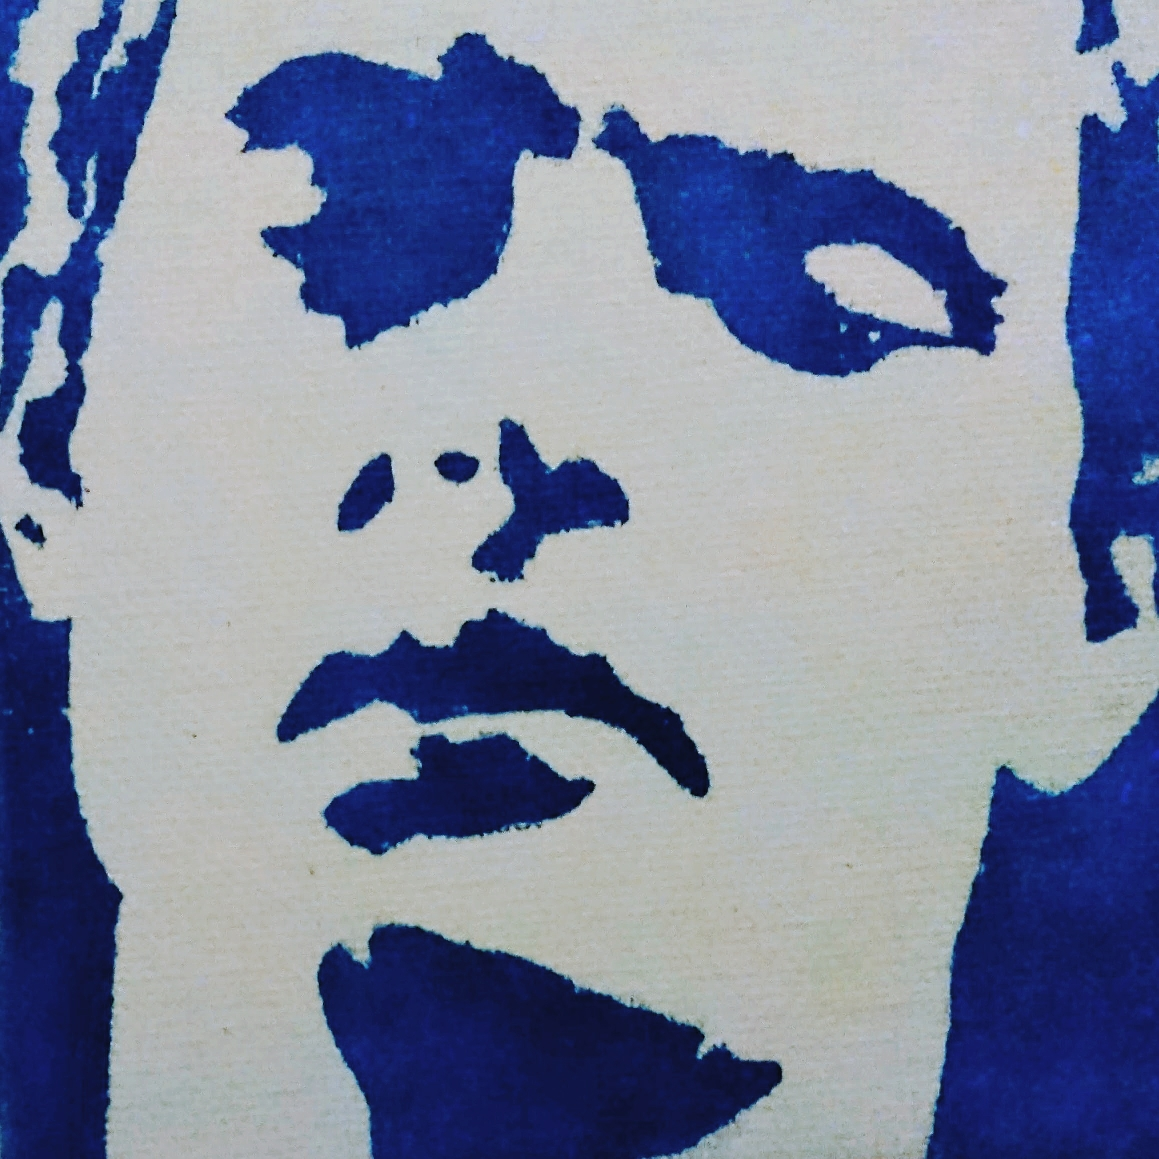 Ian Curtis, frontman Joy Division